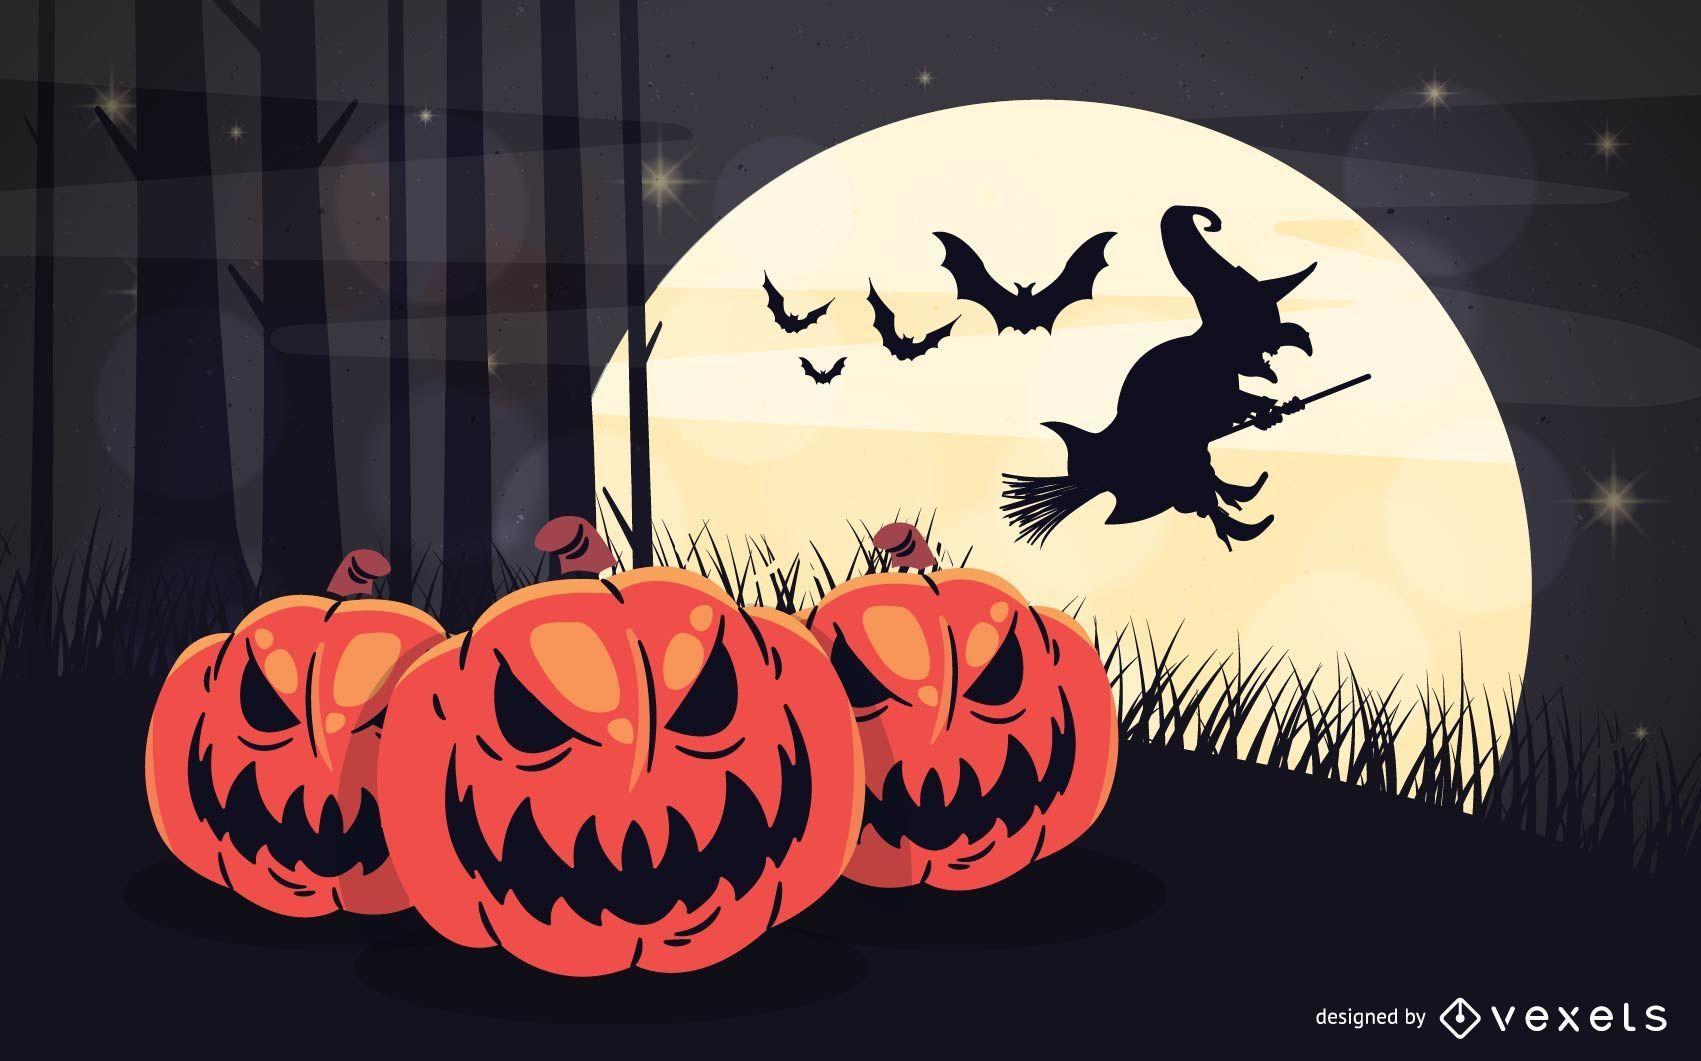 Halloween Art with Planted Evil Pumpkins